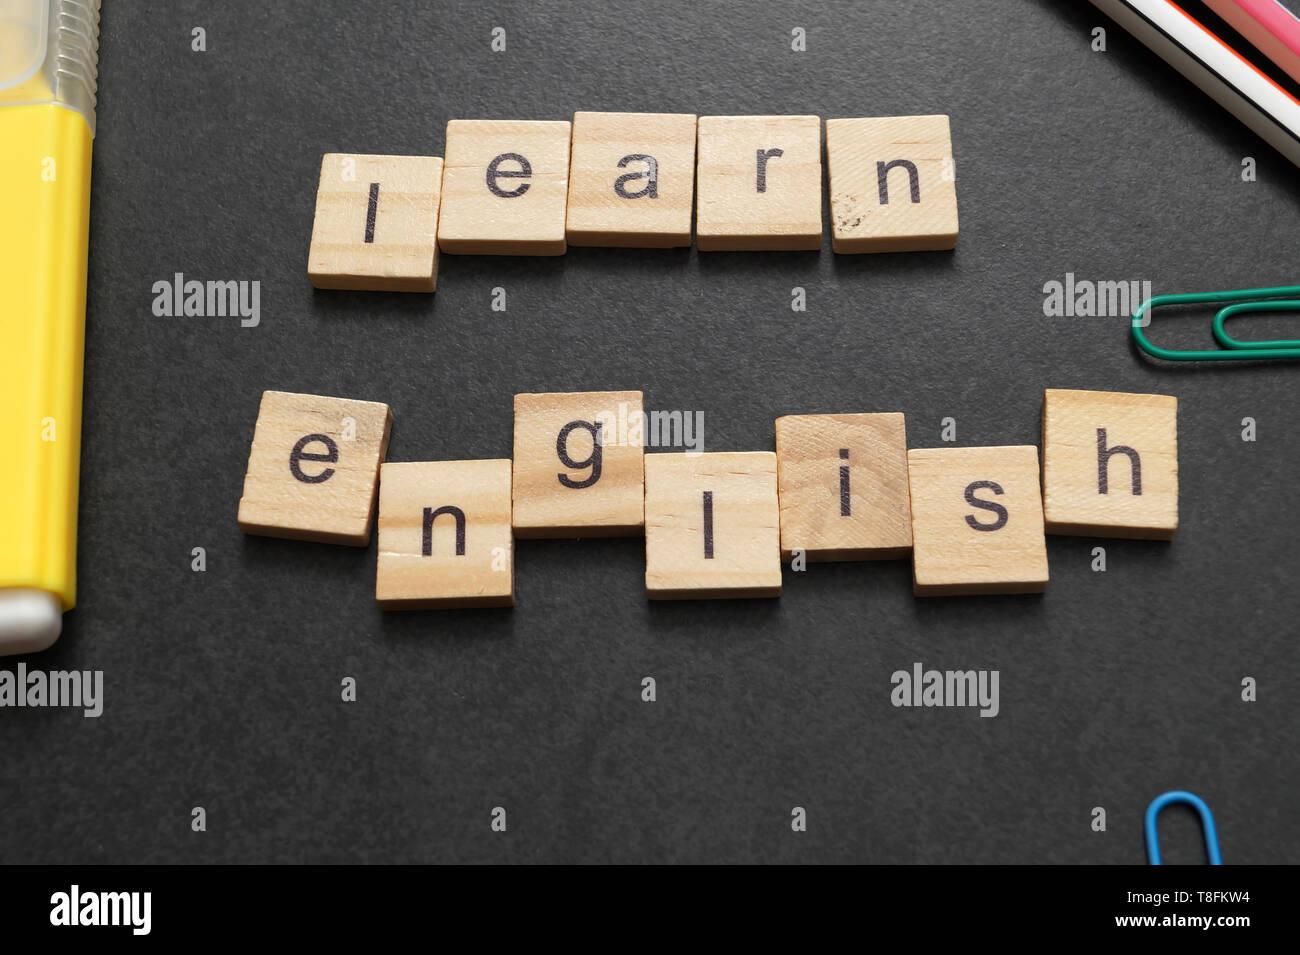 Word LEARN ENGLISH written on wood block. Close up - Stock Image